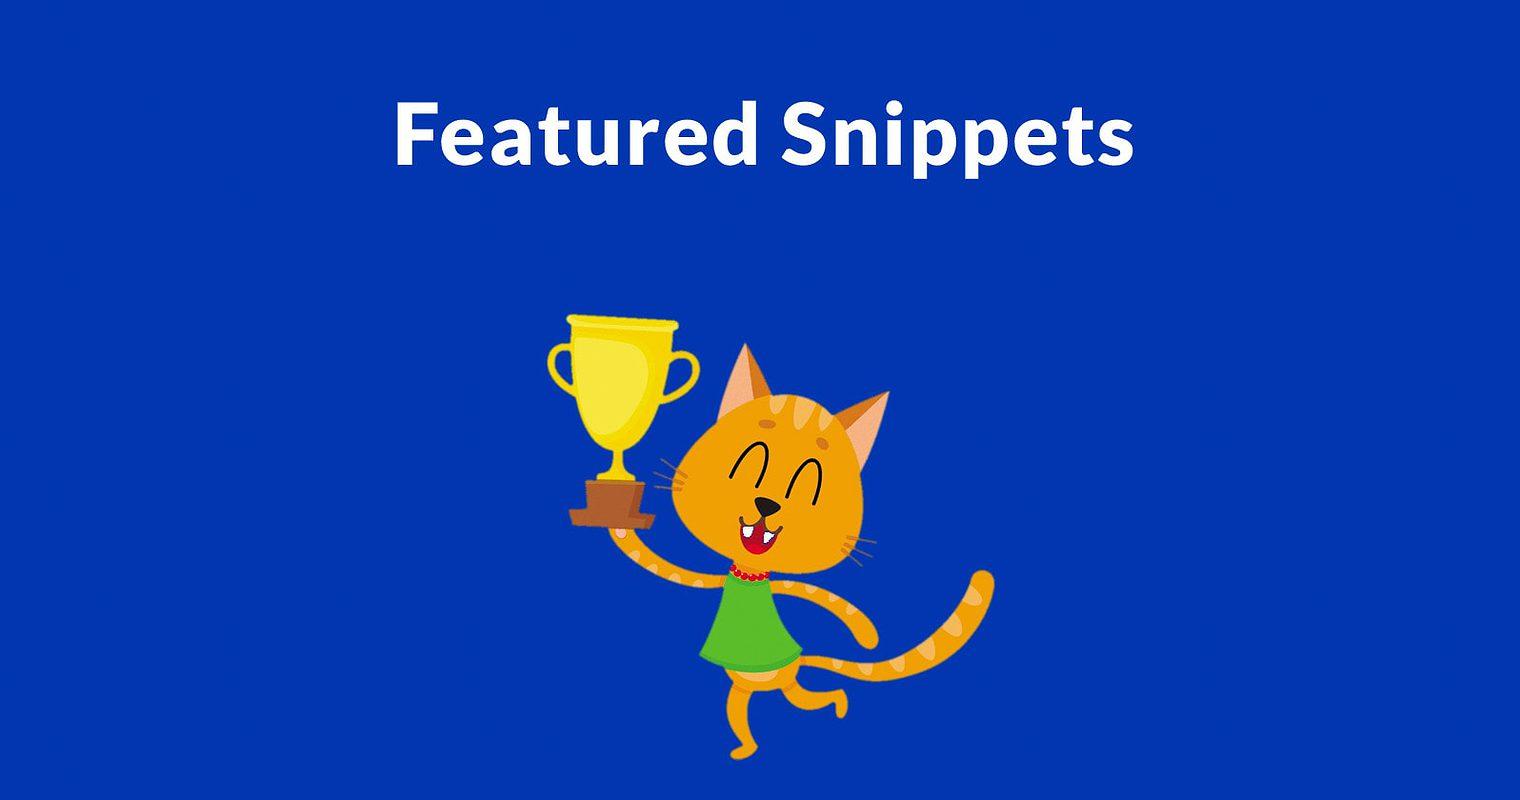 Google's John Mueller on Featured Snippets Ranking Factors